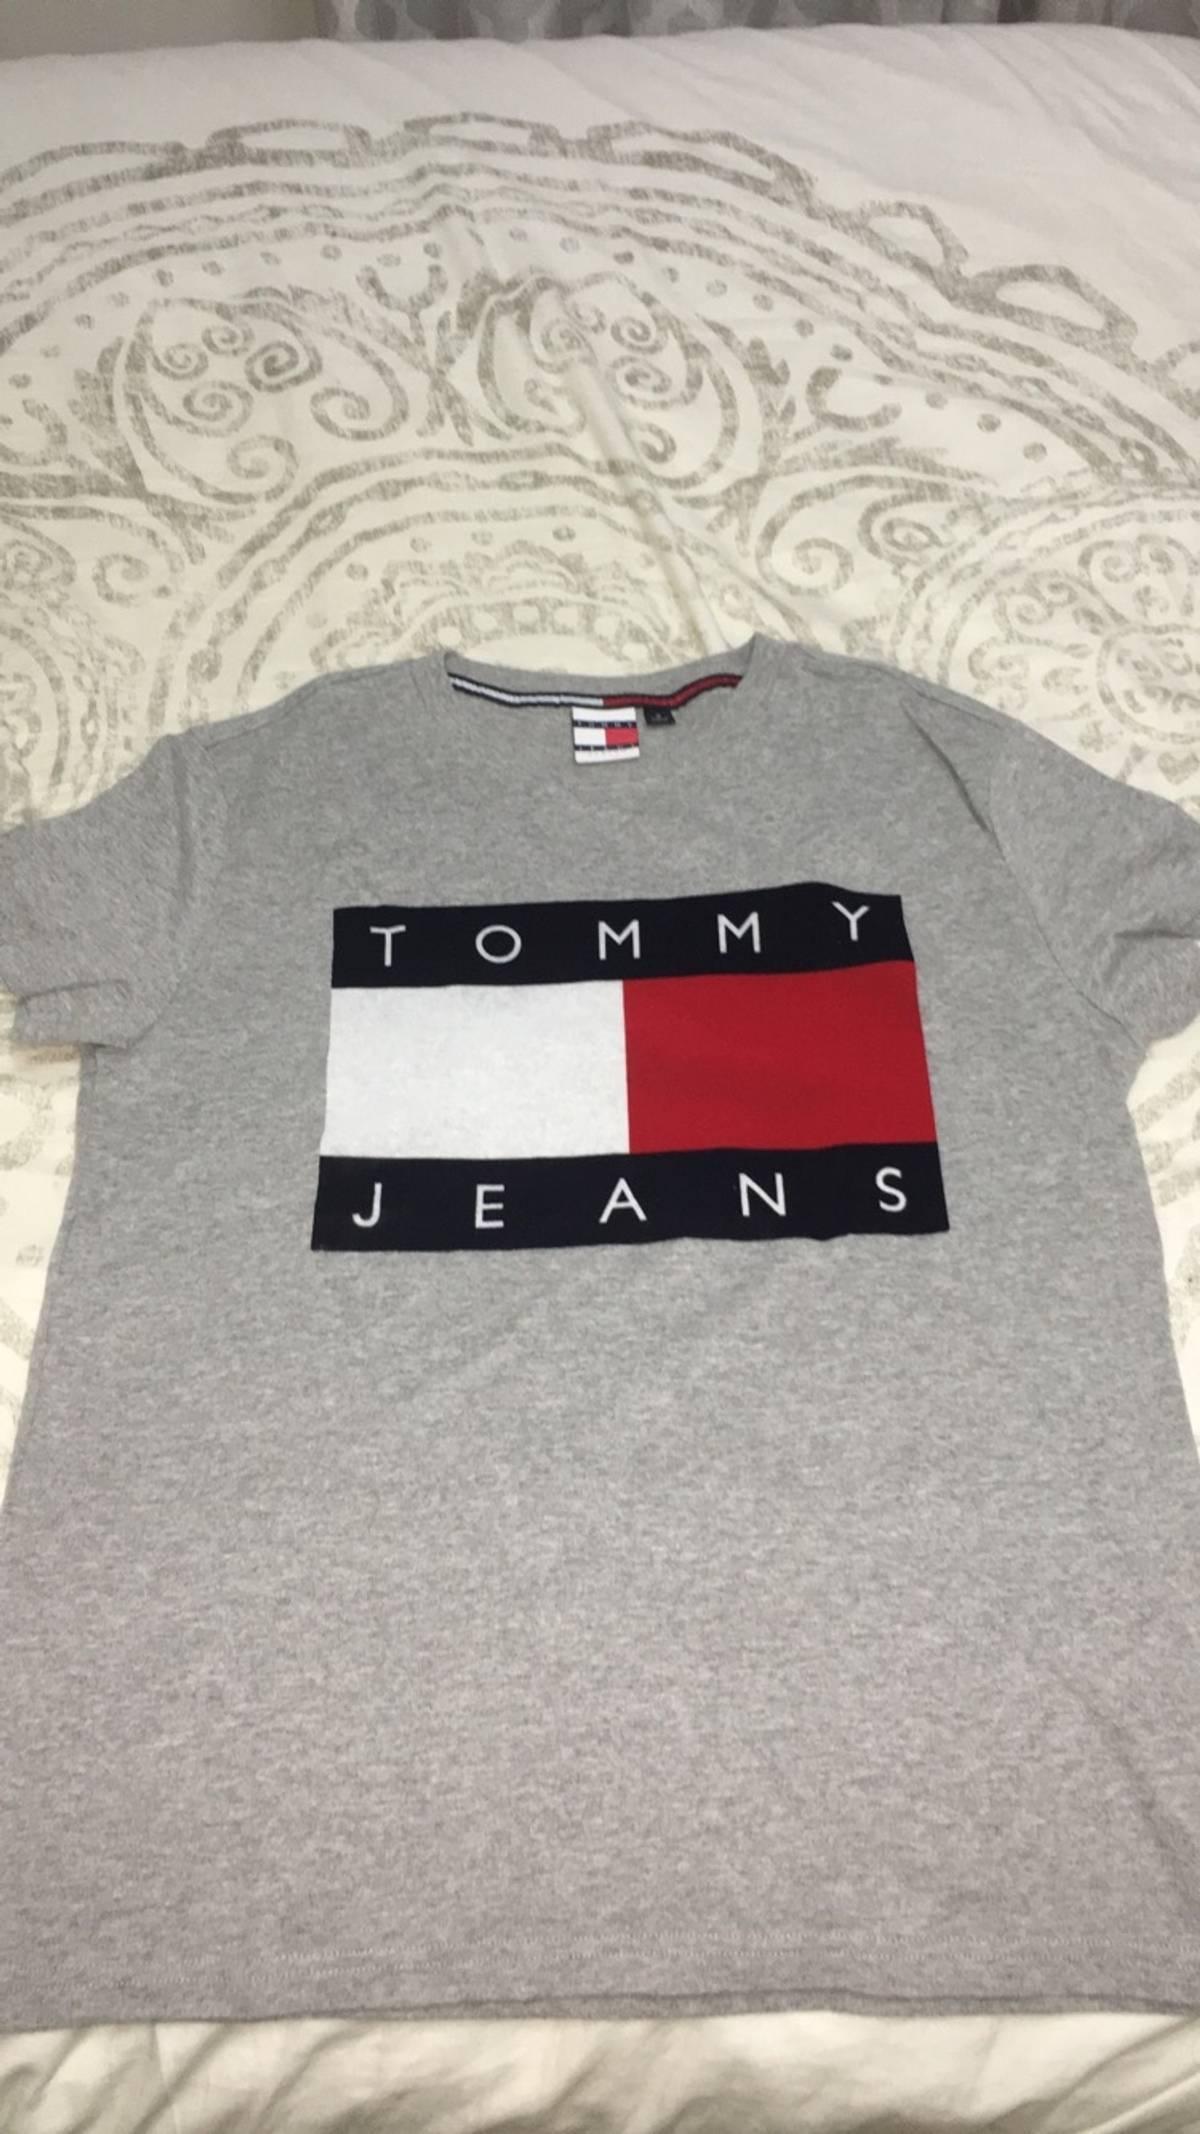 730e02554 Tommy Hilfiger Tommy Jeans 90's Flock T Shirt Size M | Grailed